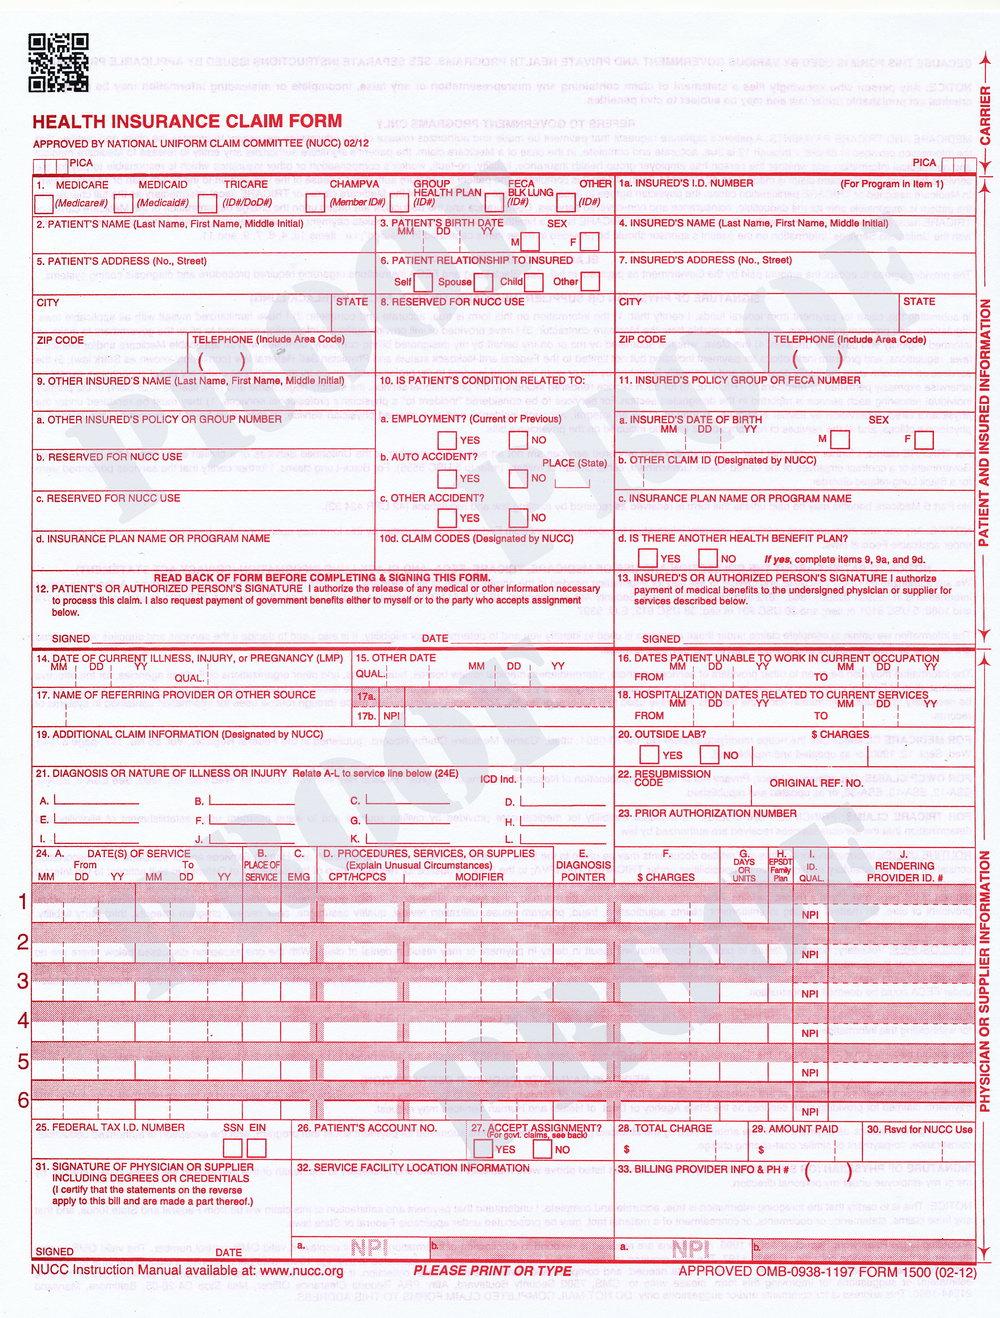 Hcfa 1500 Form Download